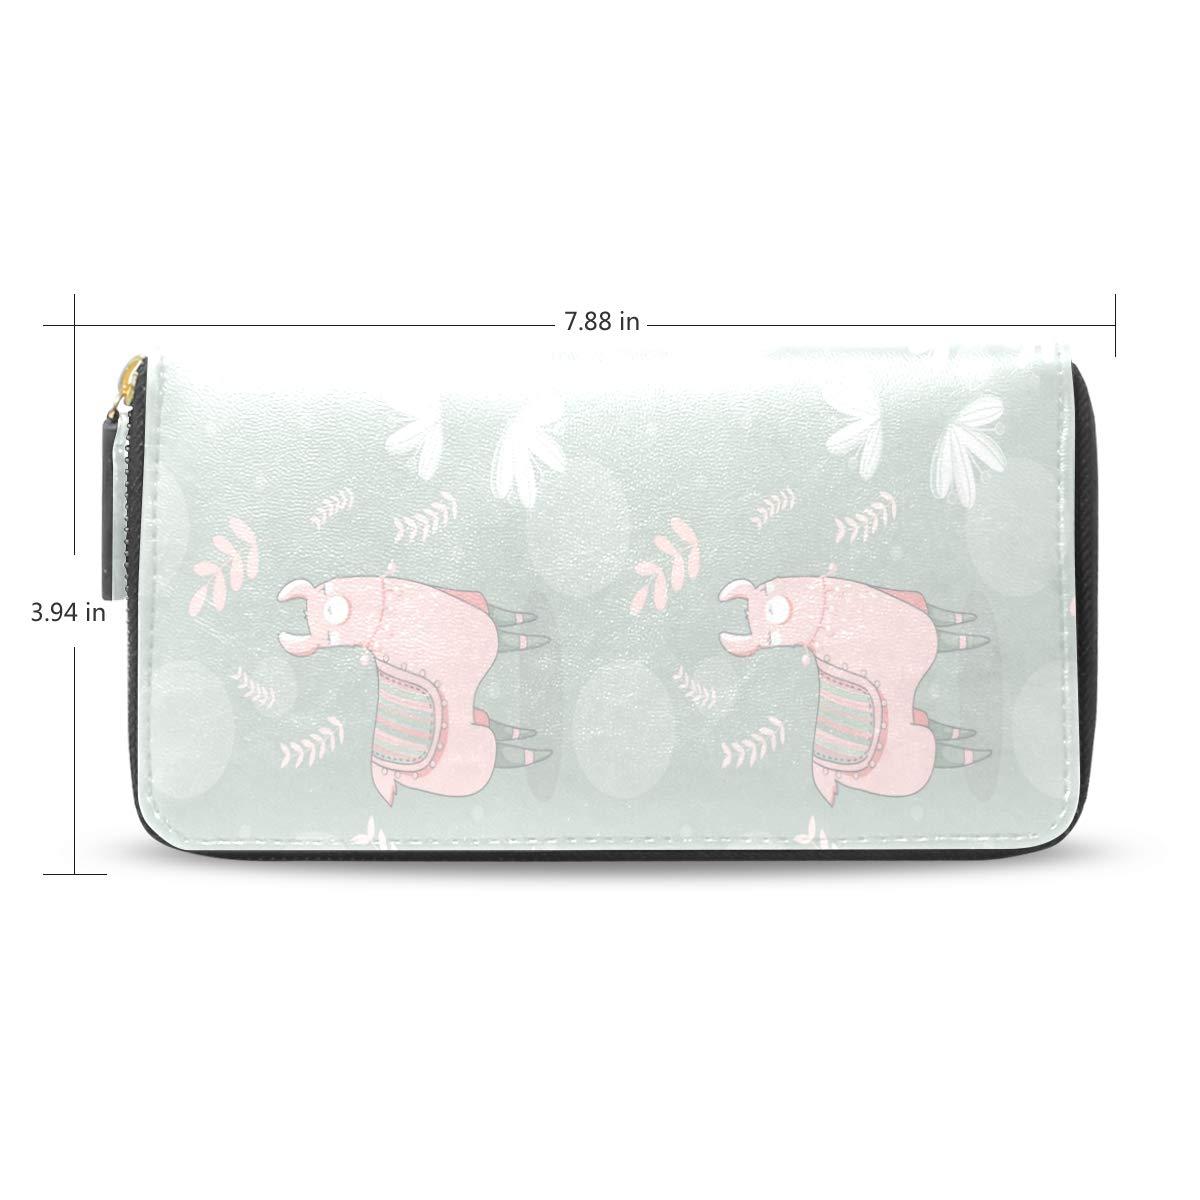 Women Lama Light Green Leather Wallet Large Capacity Zipper Travel Wristlet Bags Clutch Cellphone Bag